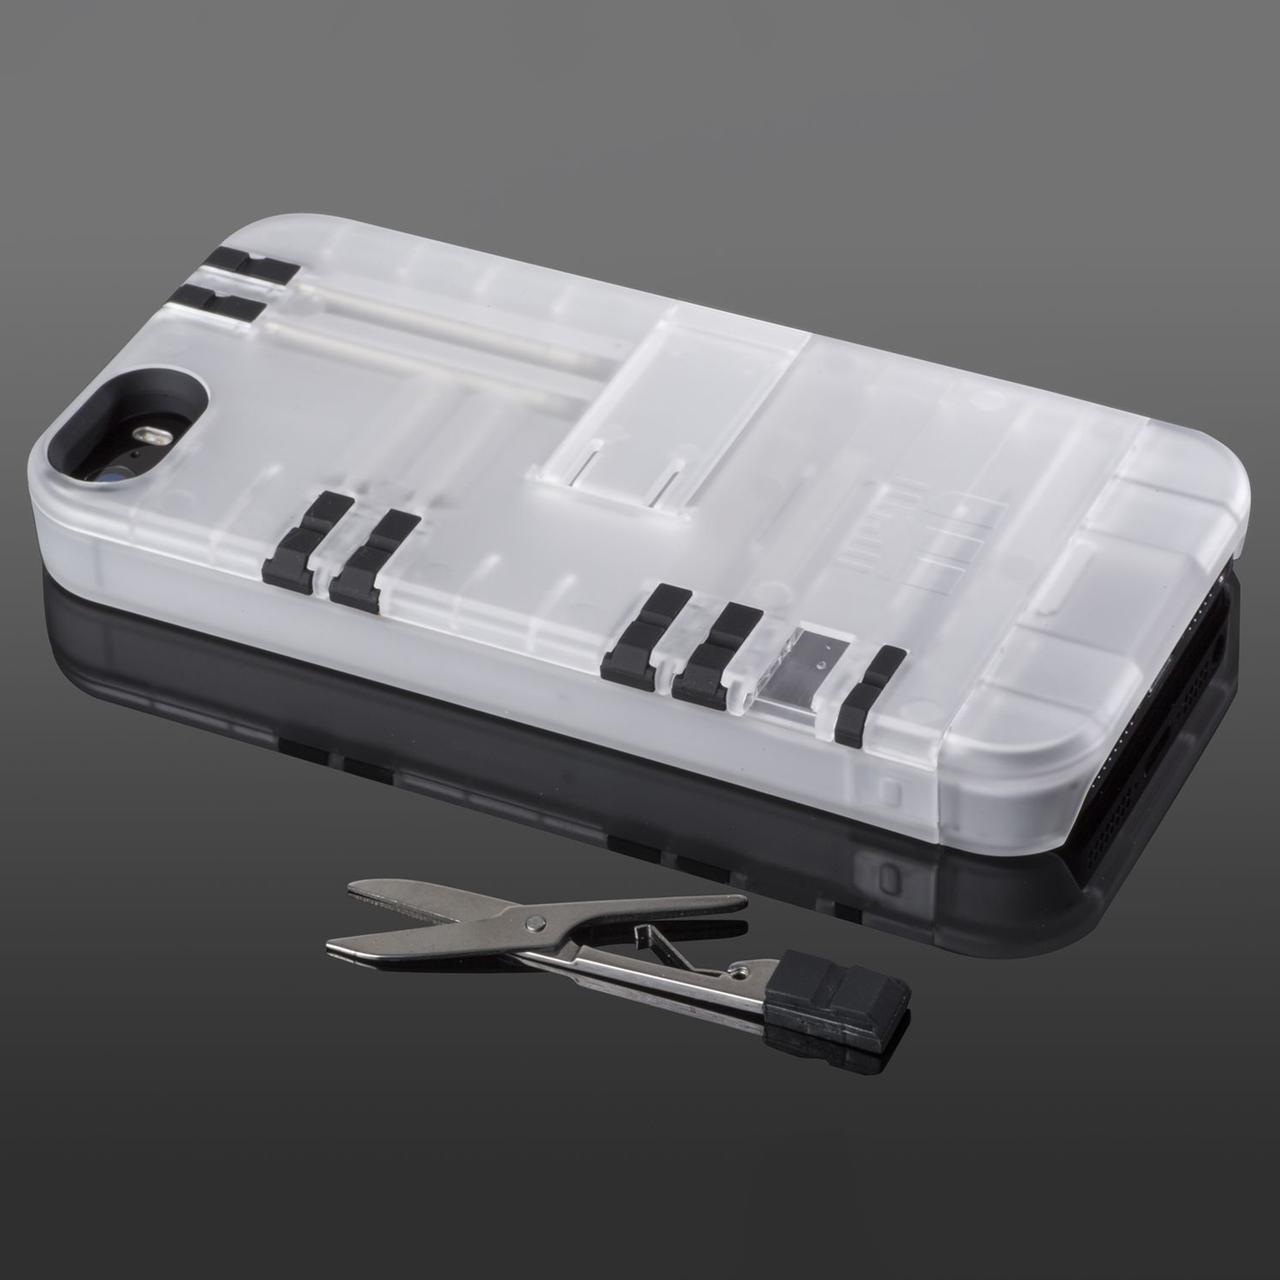 Fancy - IN1 iPhone 5/5s Tool Case